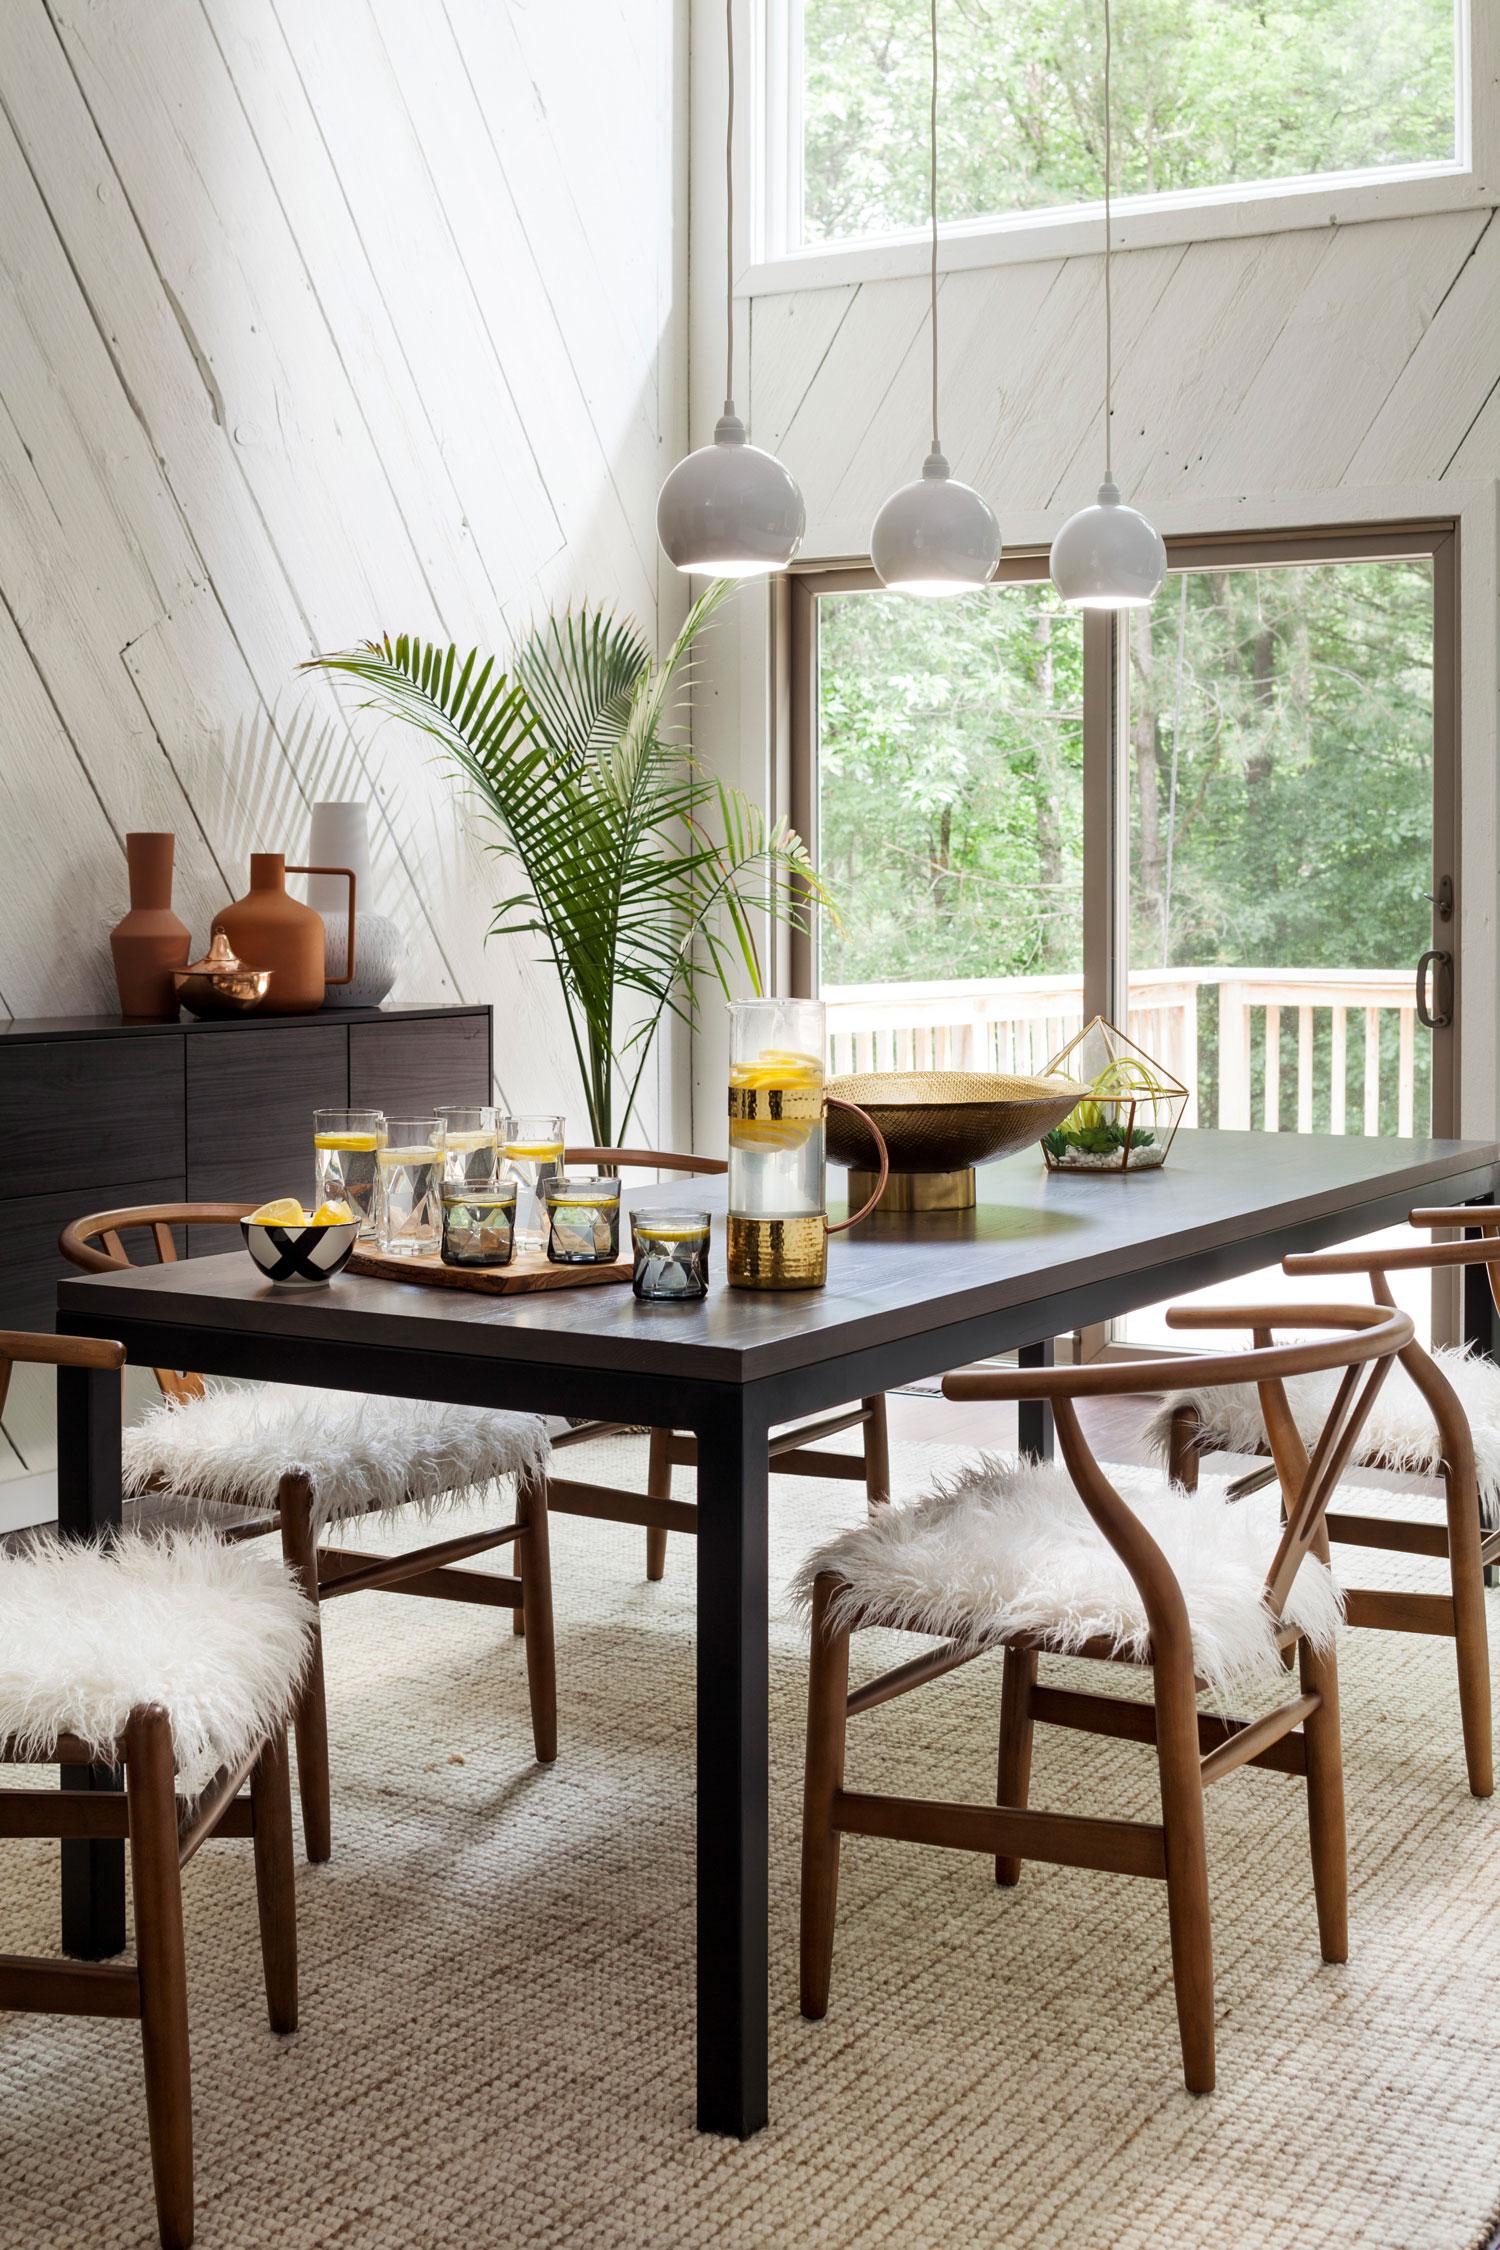 minneapolis-st-paul-home-decor-interior-designer-interior-stylist-interior-design-8.jpg